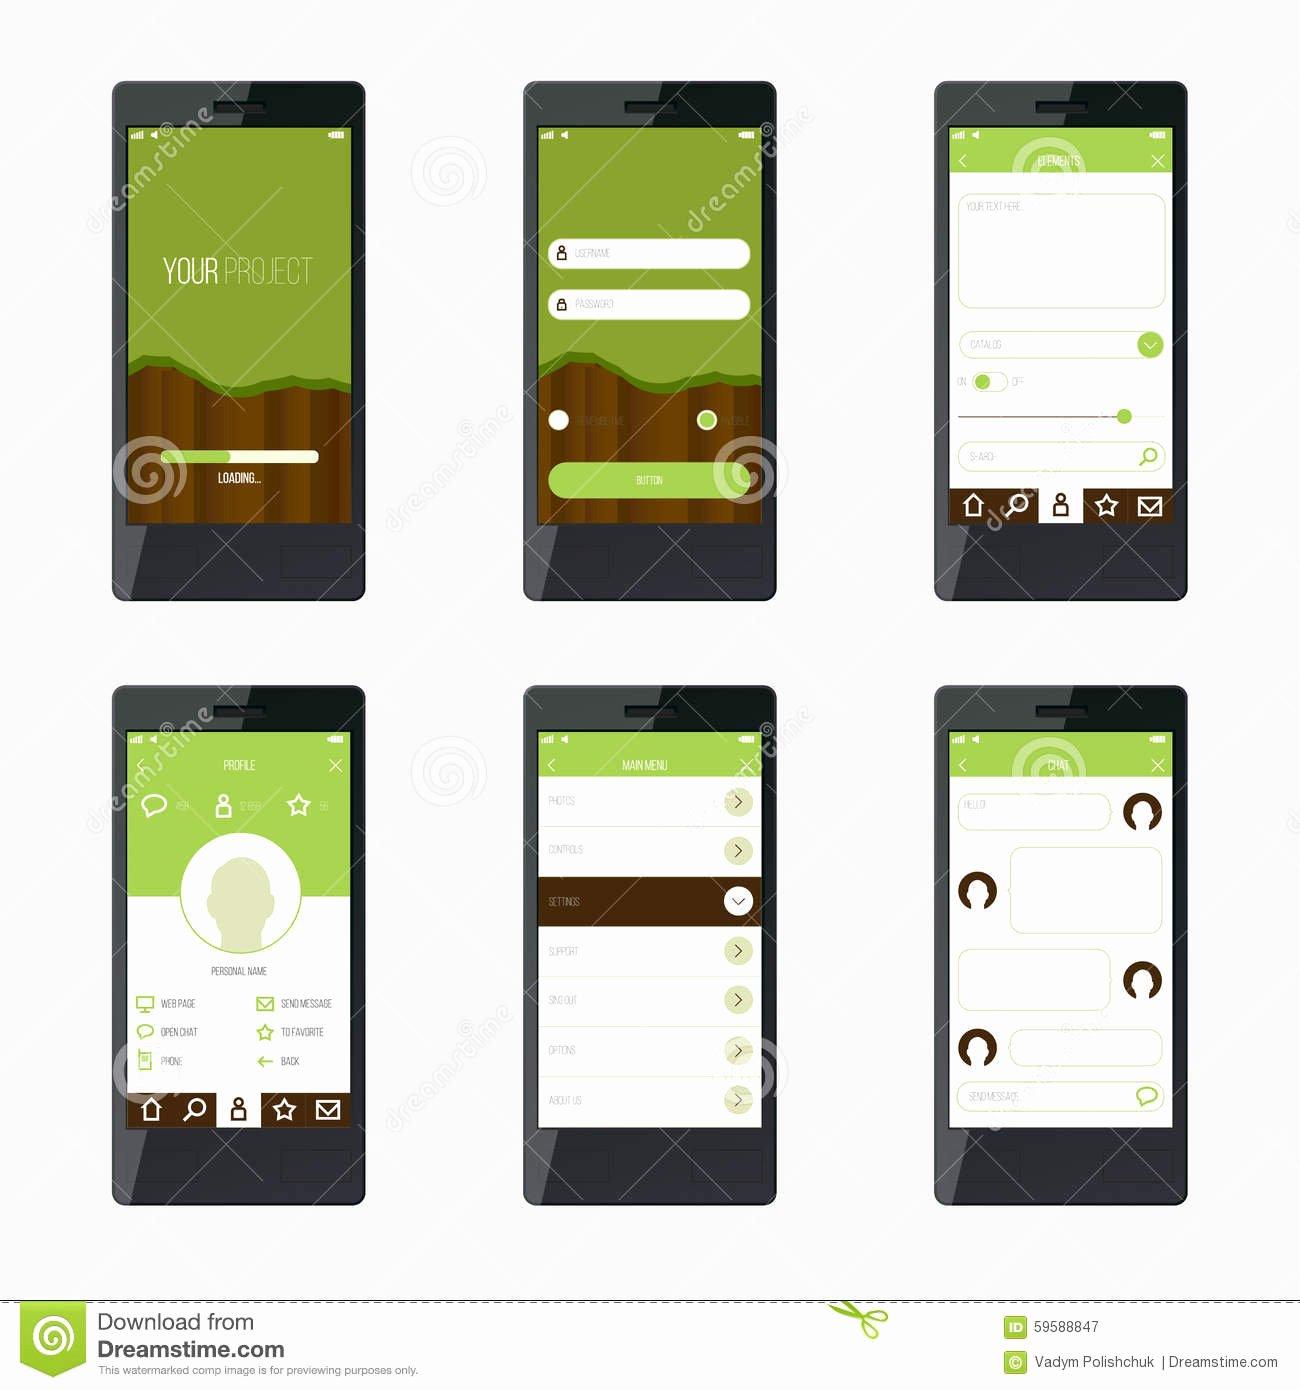 Mobile App Design Template Beautiful Template Mobile Application Interface Design Stock Vector